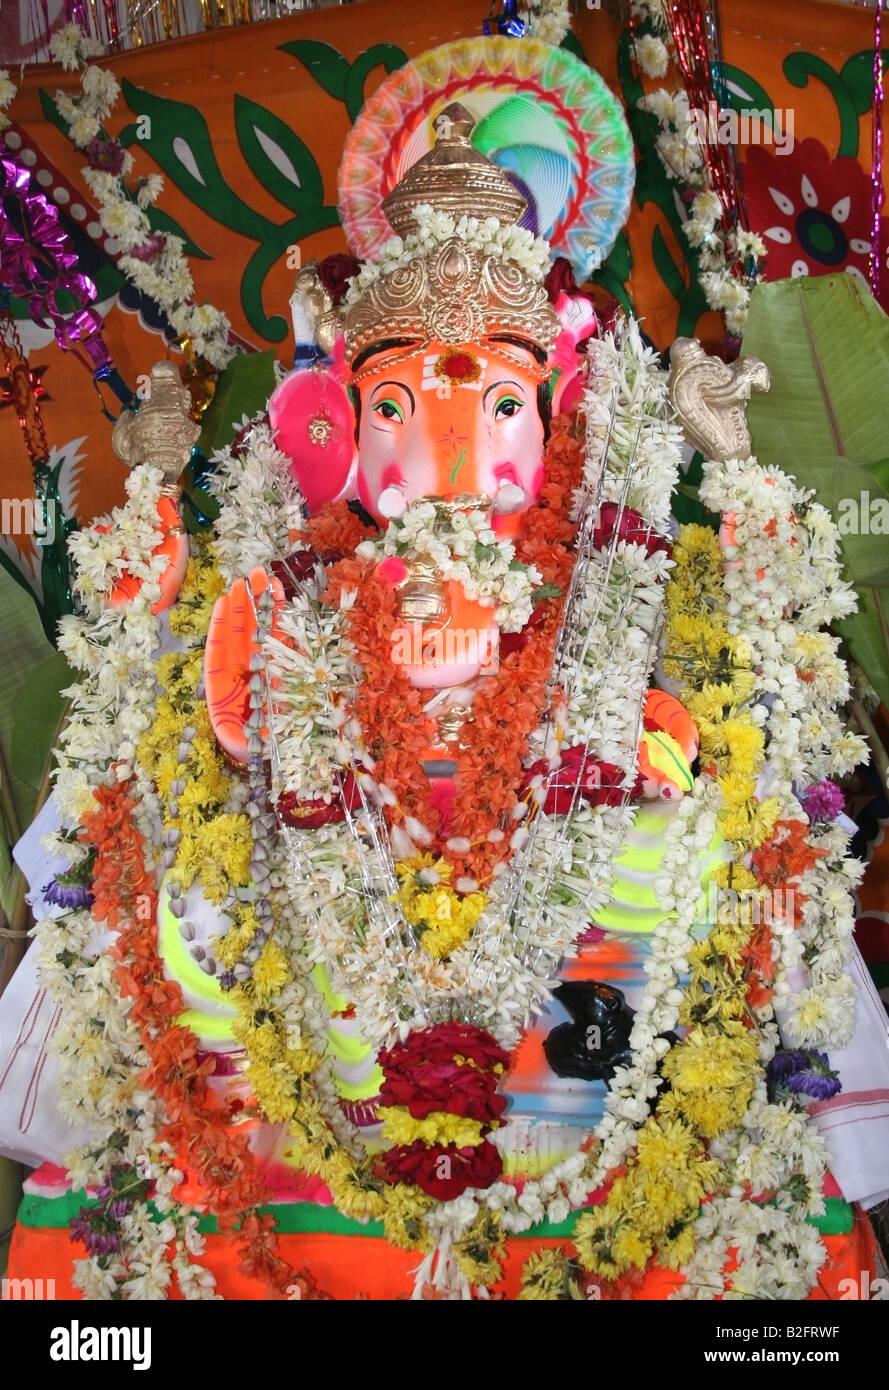 Decorated Ganesh Statue Ganesh Chaturthi Festival India Stock